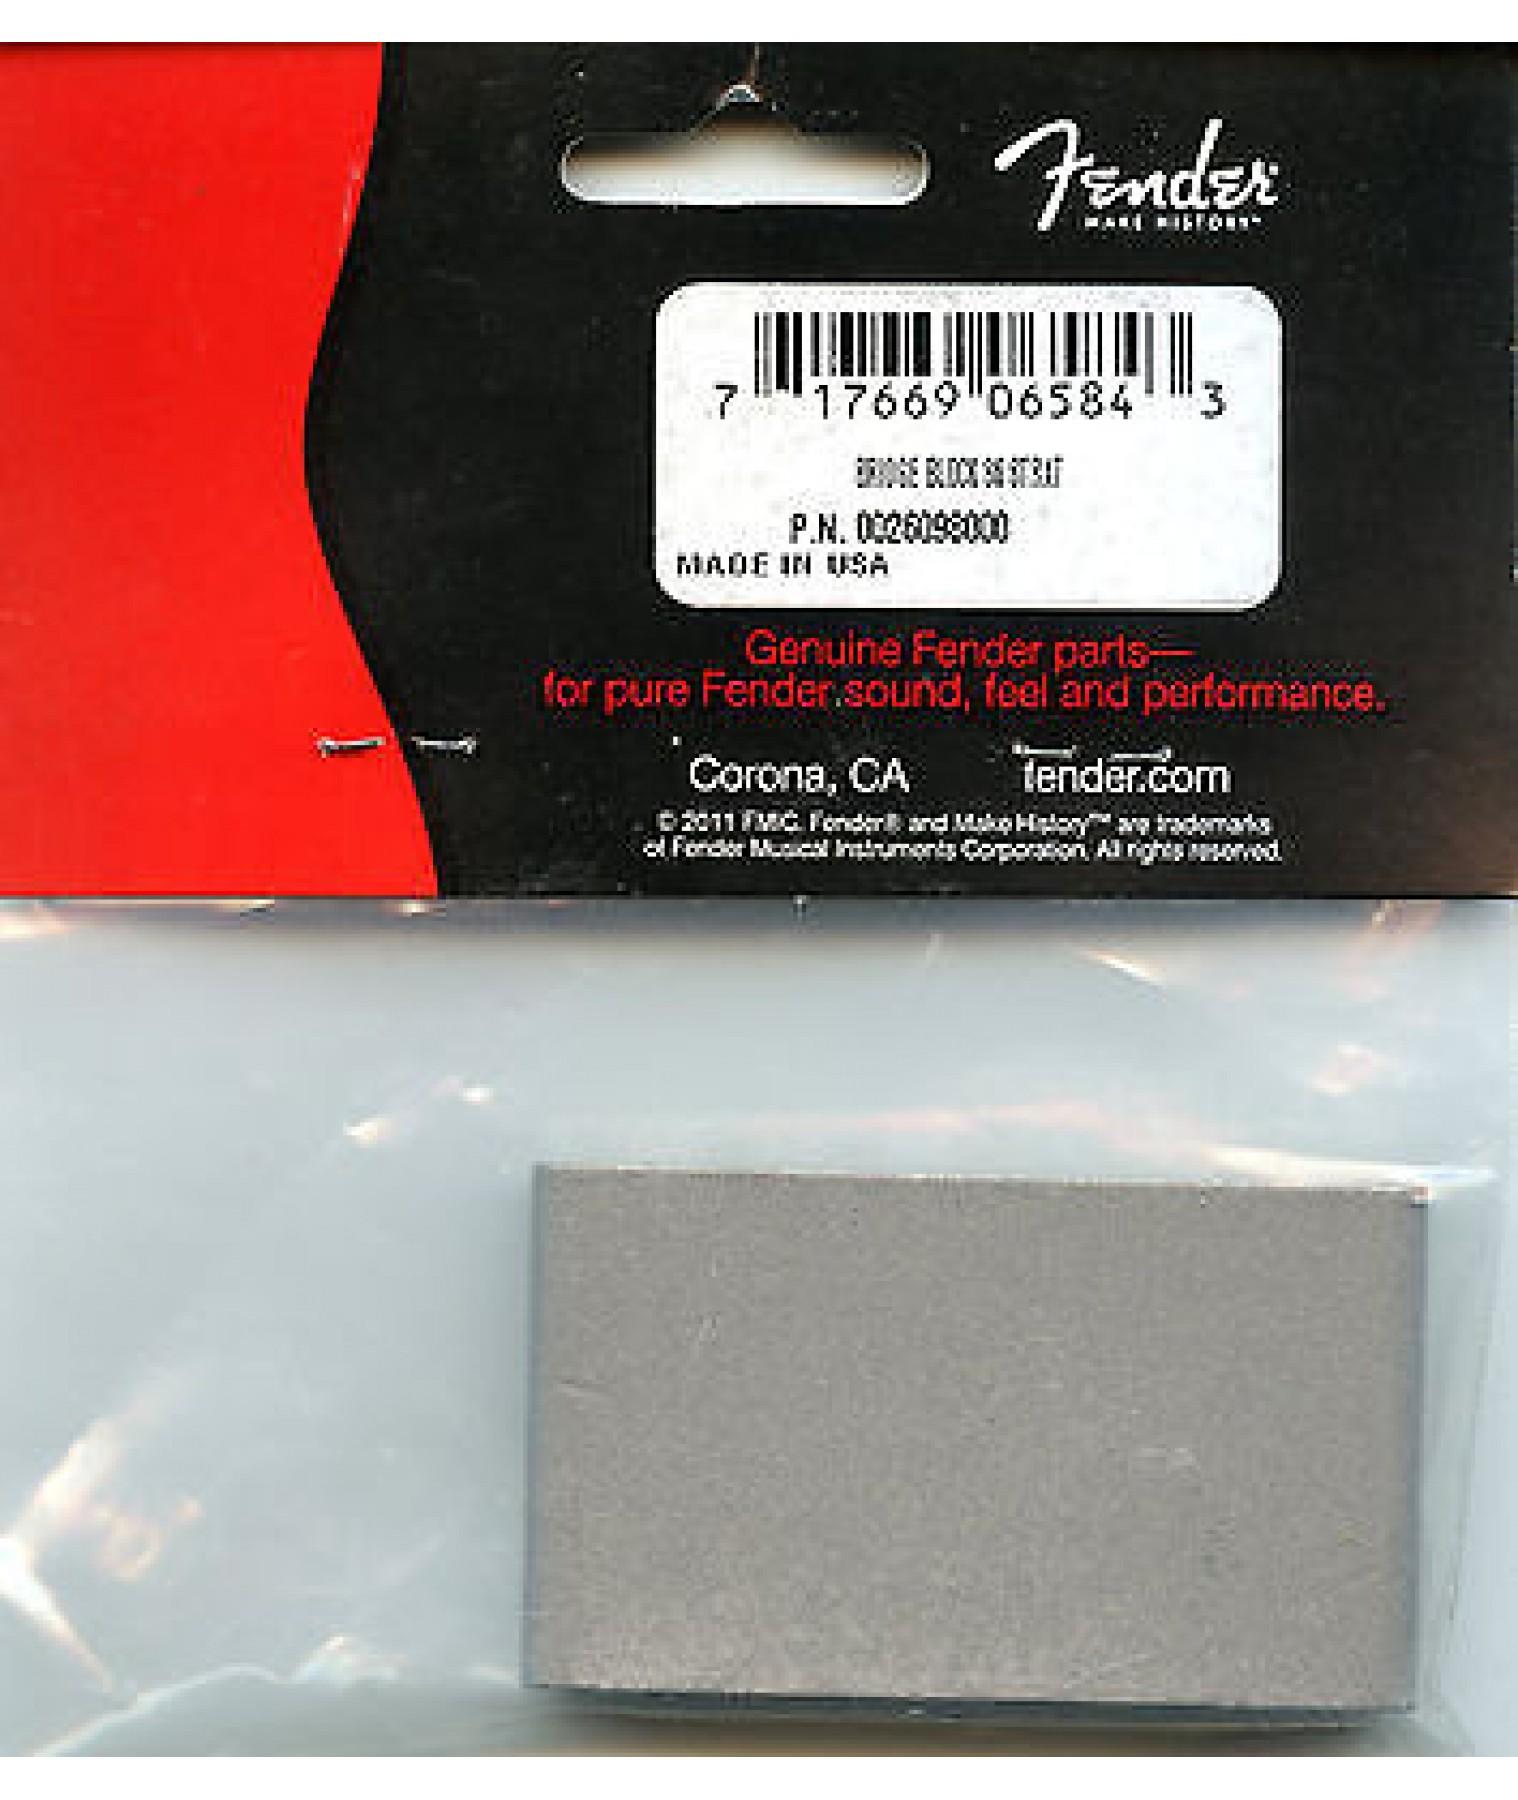 86 To '07 Steel Tremolo Bridge Block Fender 0026098000